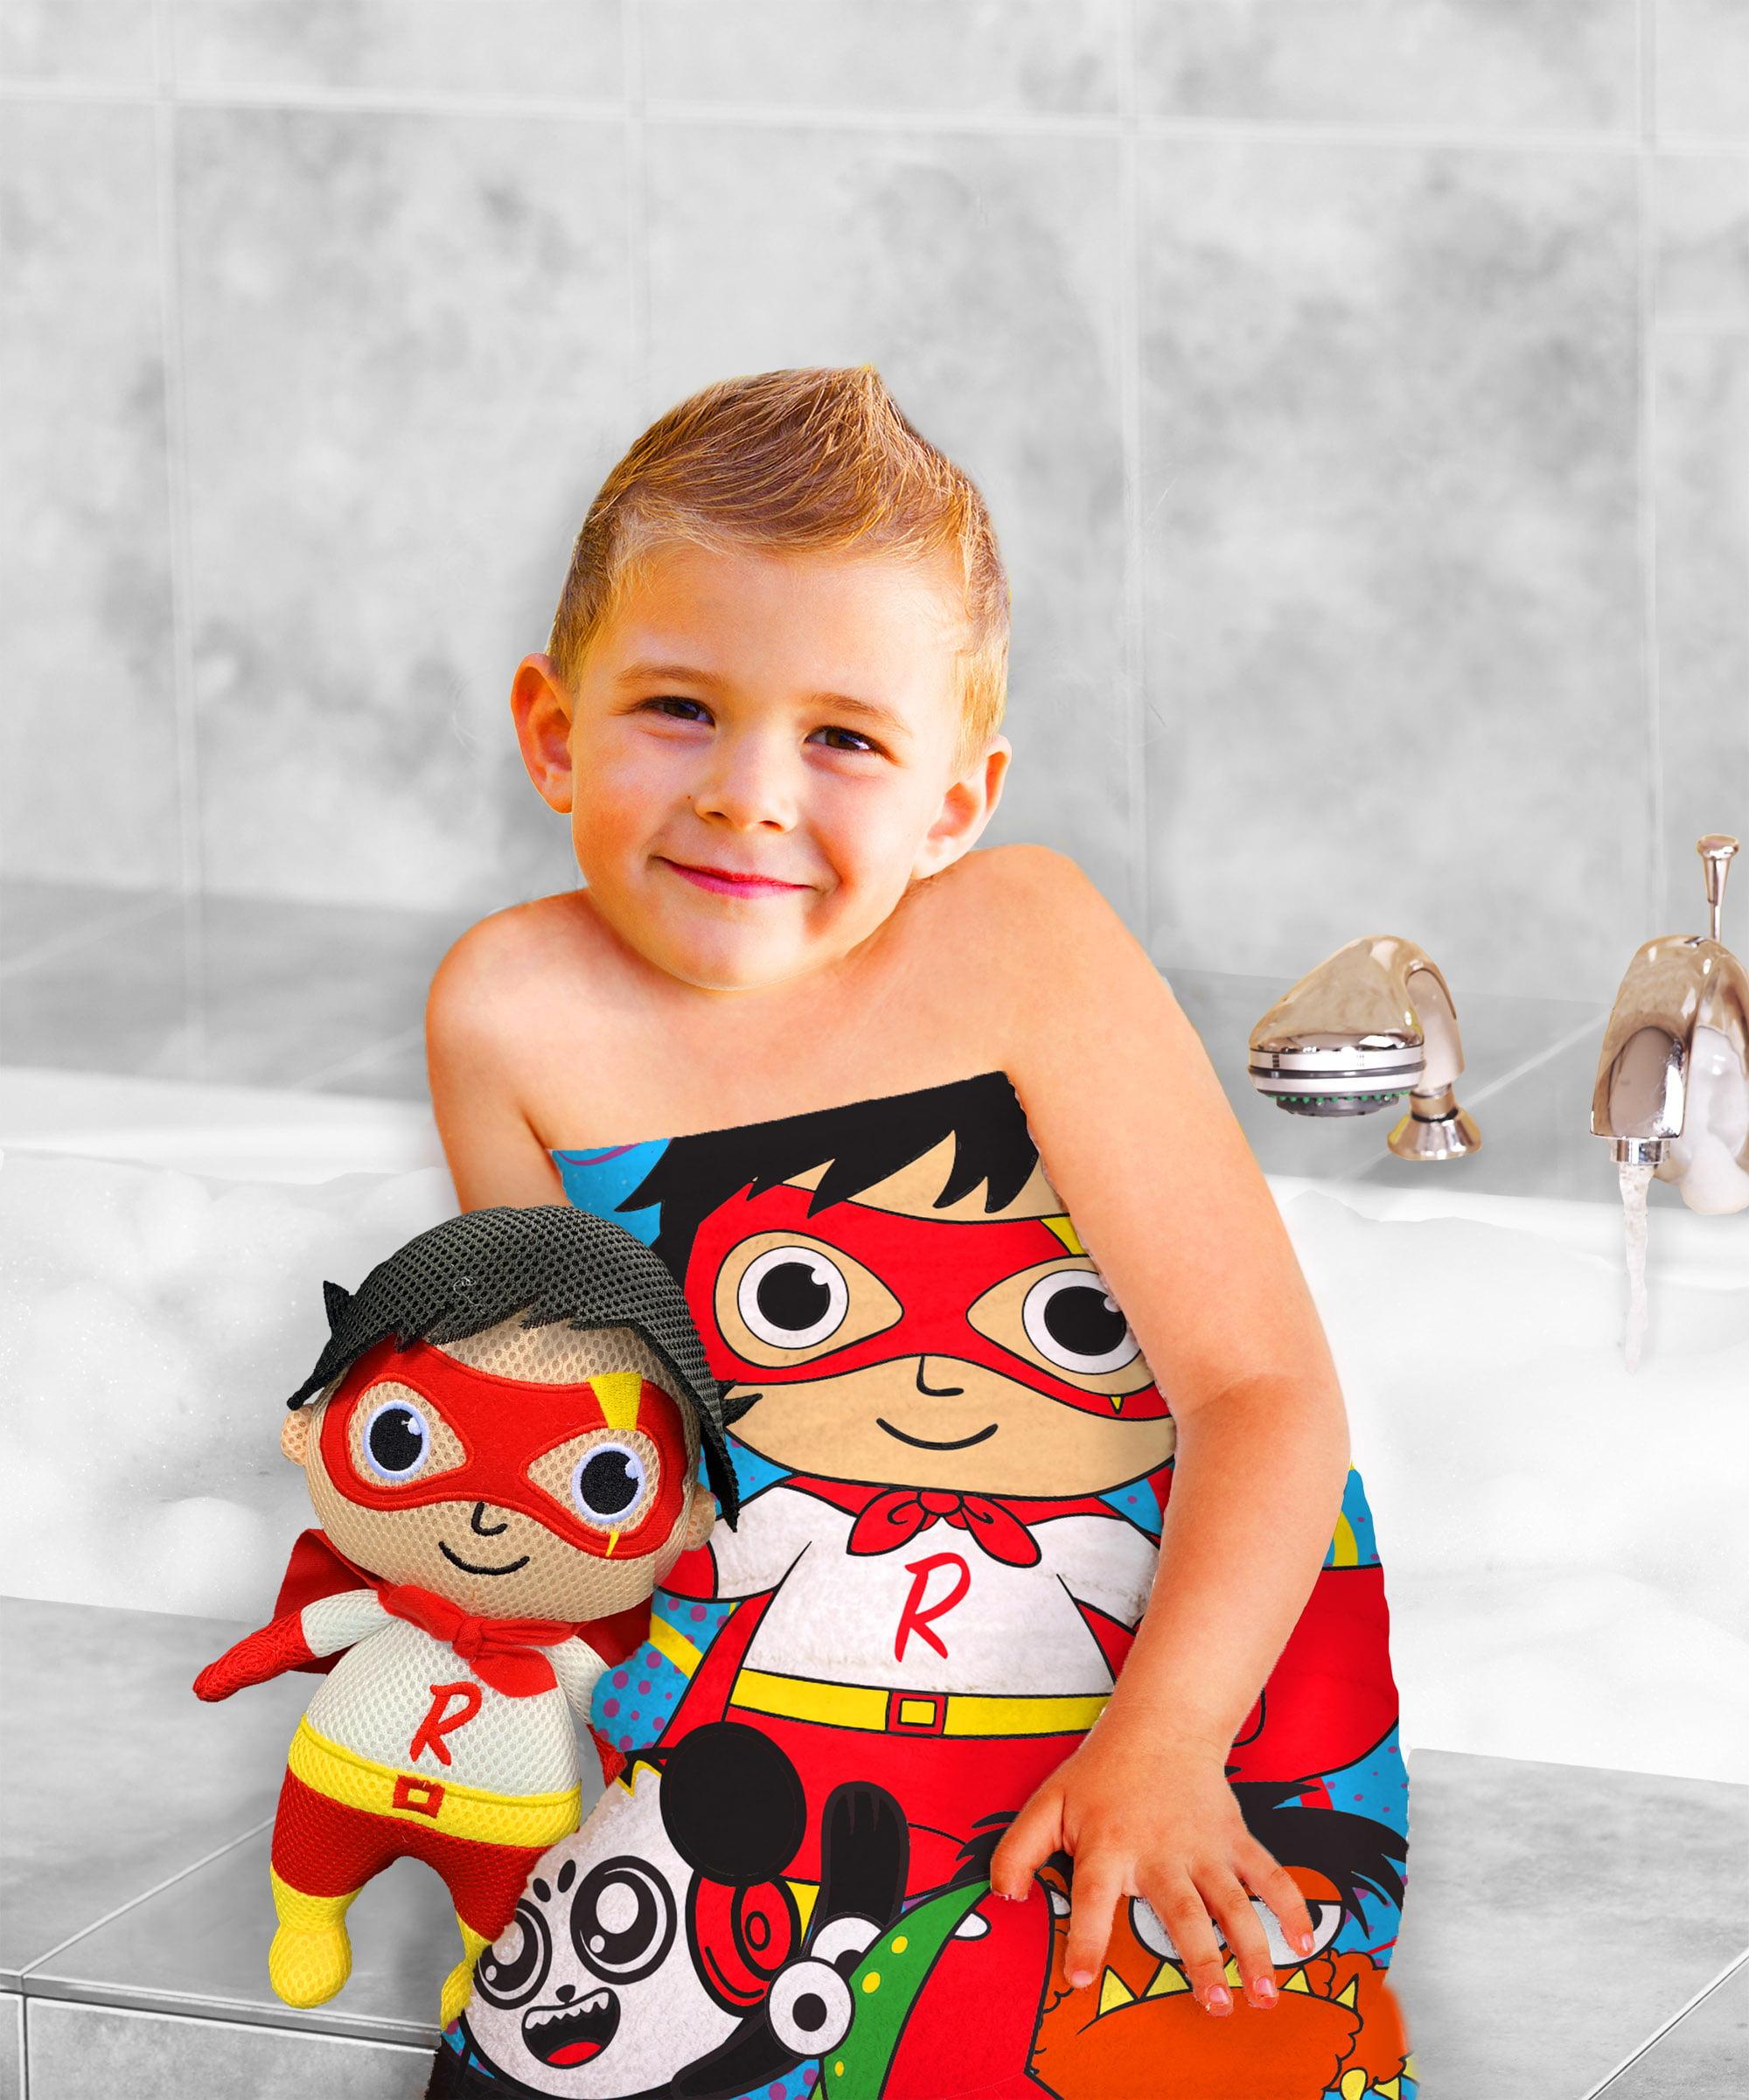 Ryan's World 2-Piece Bath Towel and Character Scrubby Set, Kids Bath Set, Red Titan